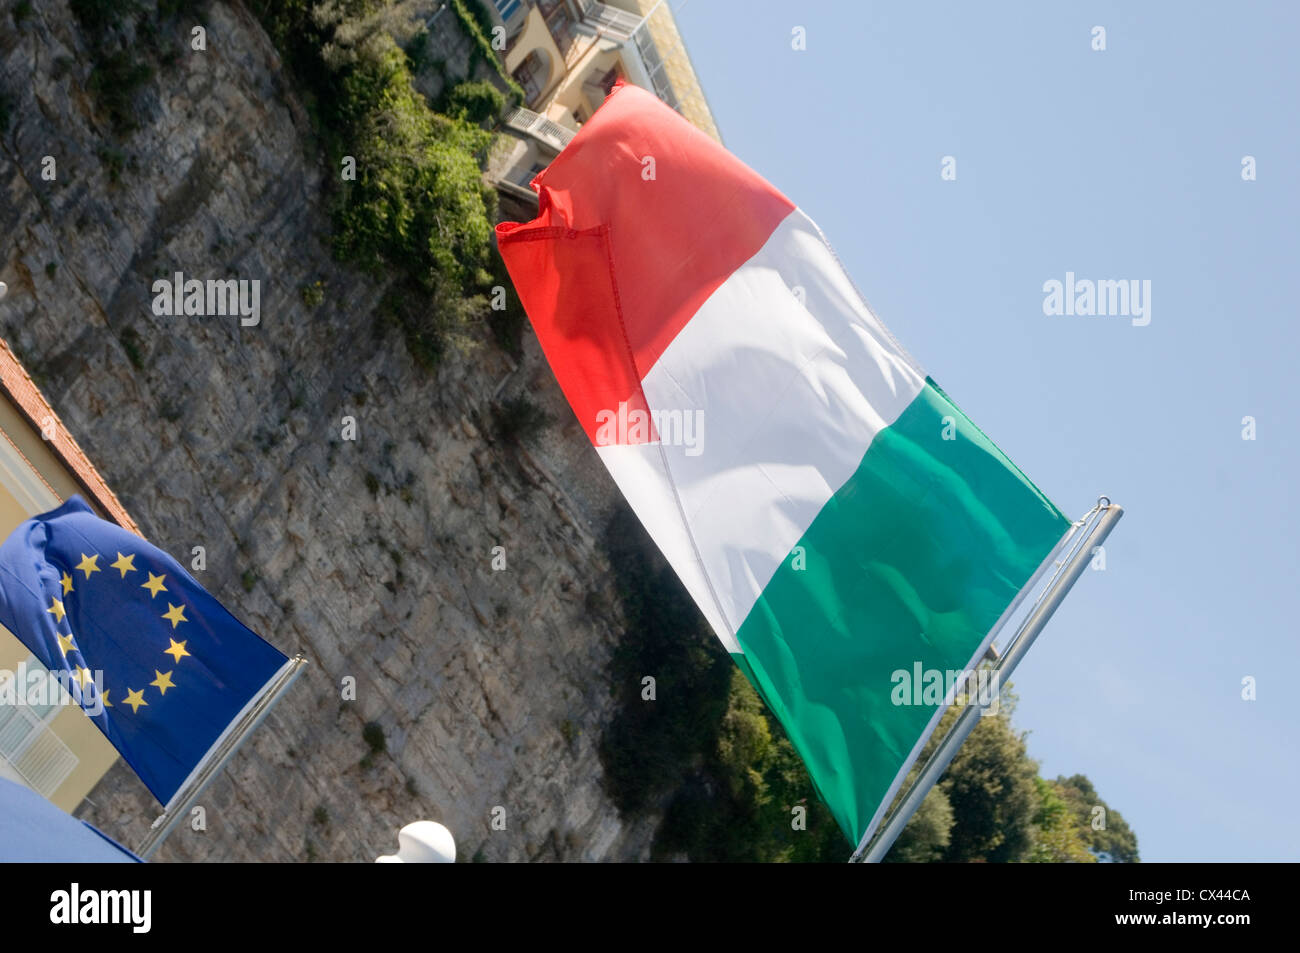 italy italian flag debt economy european euro zone eurozone tricolor - Stock Image